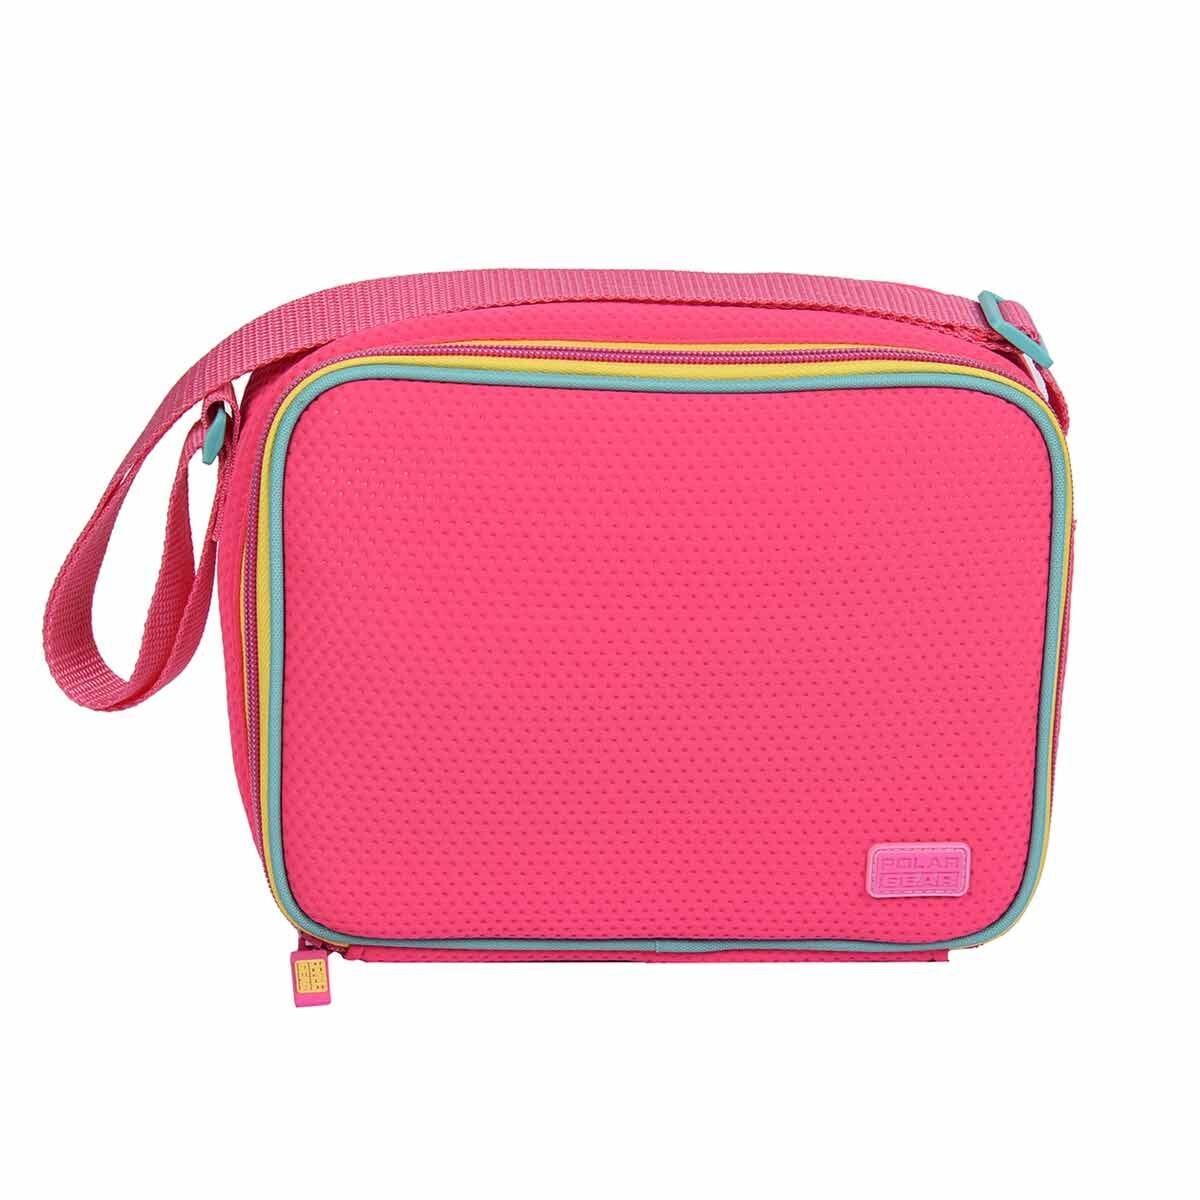 Polar Gear Active Munich Insulated Lunch Bag Pink